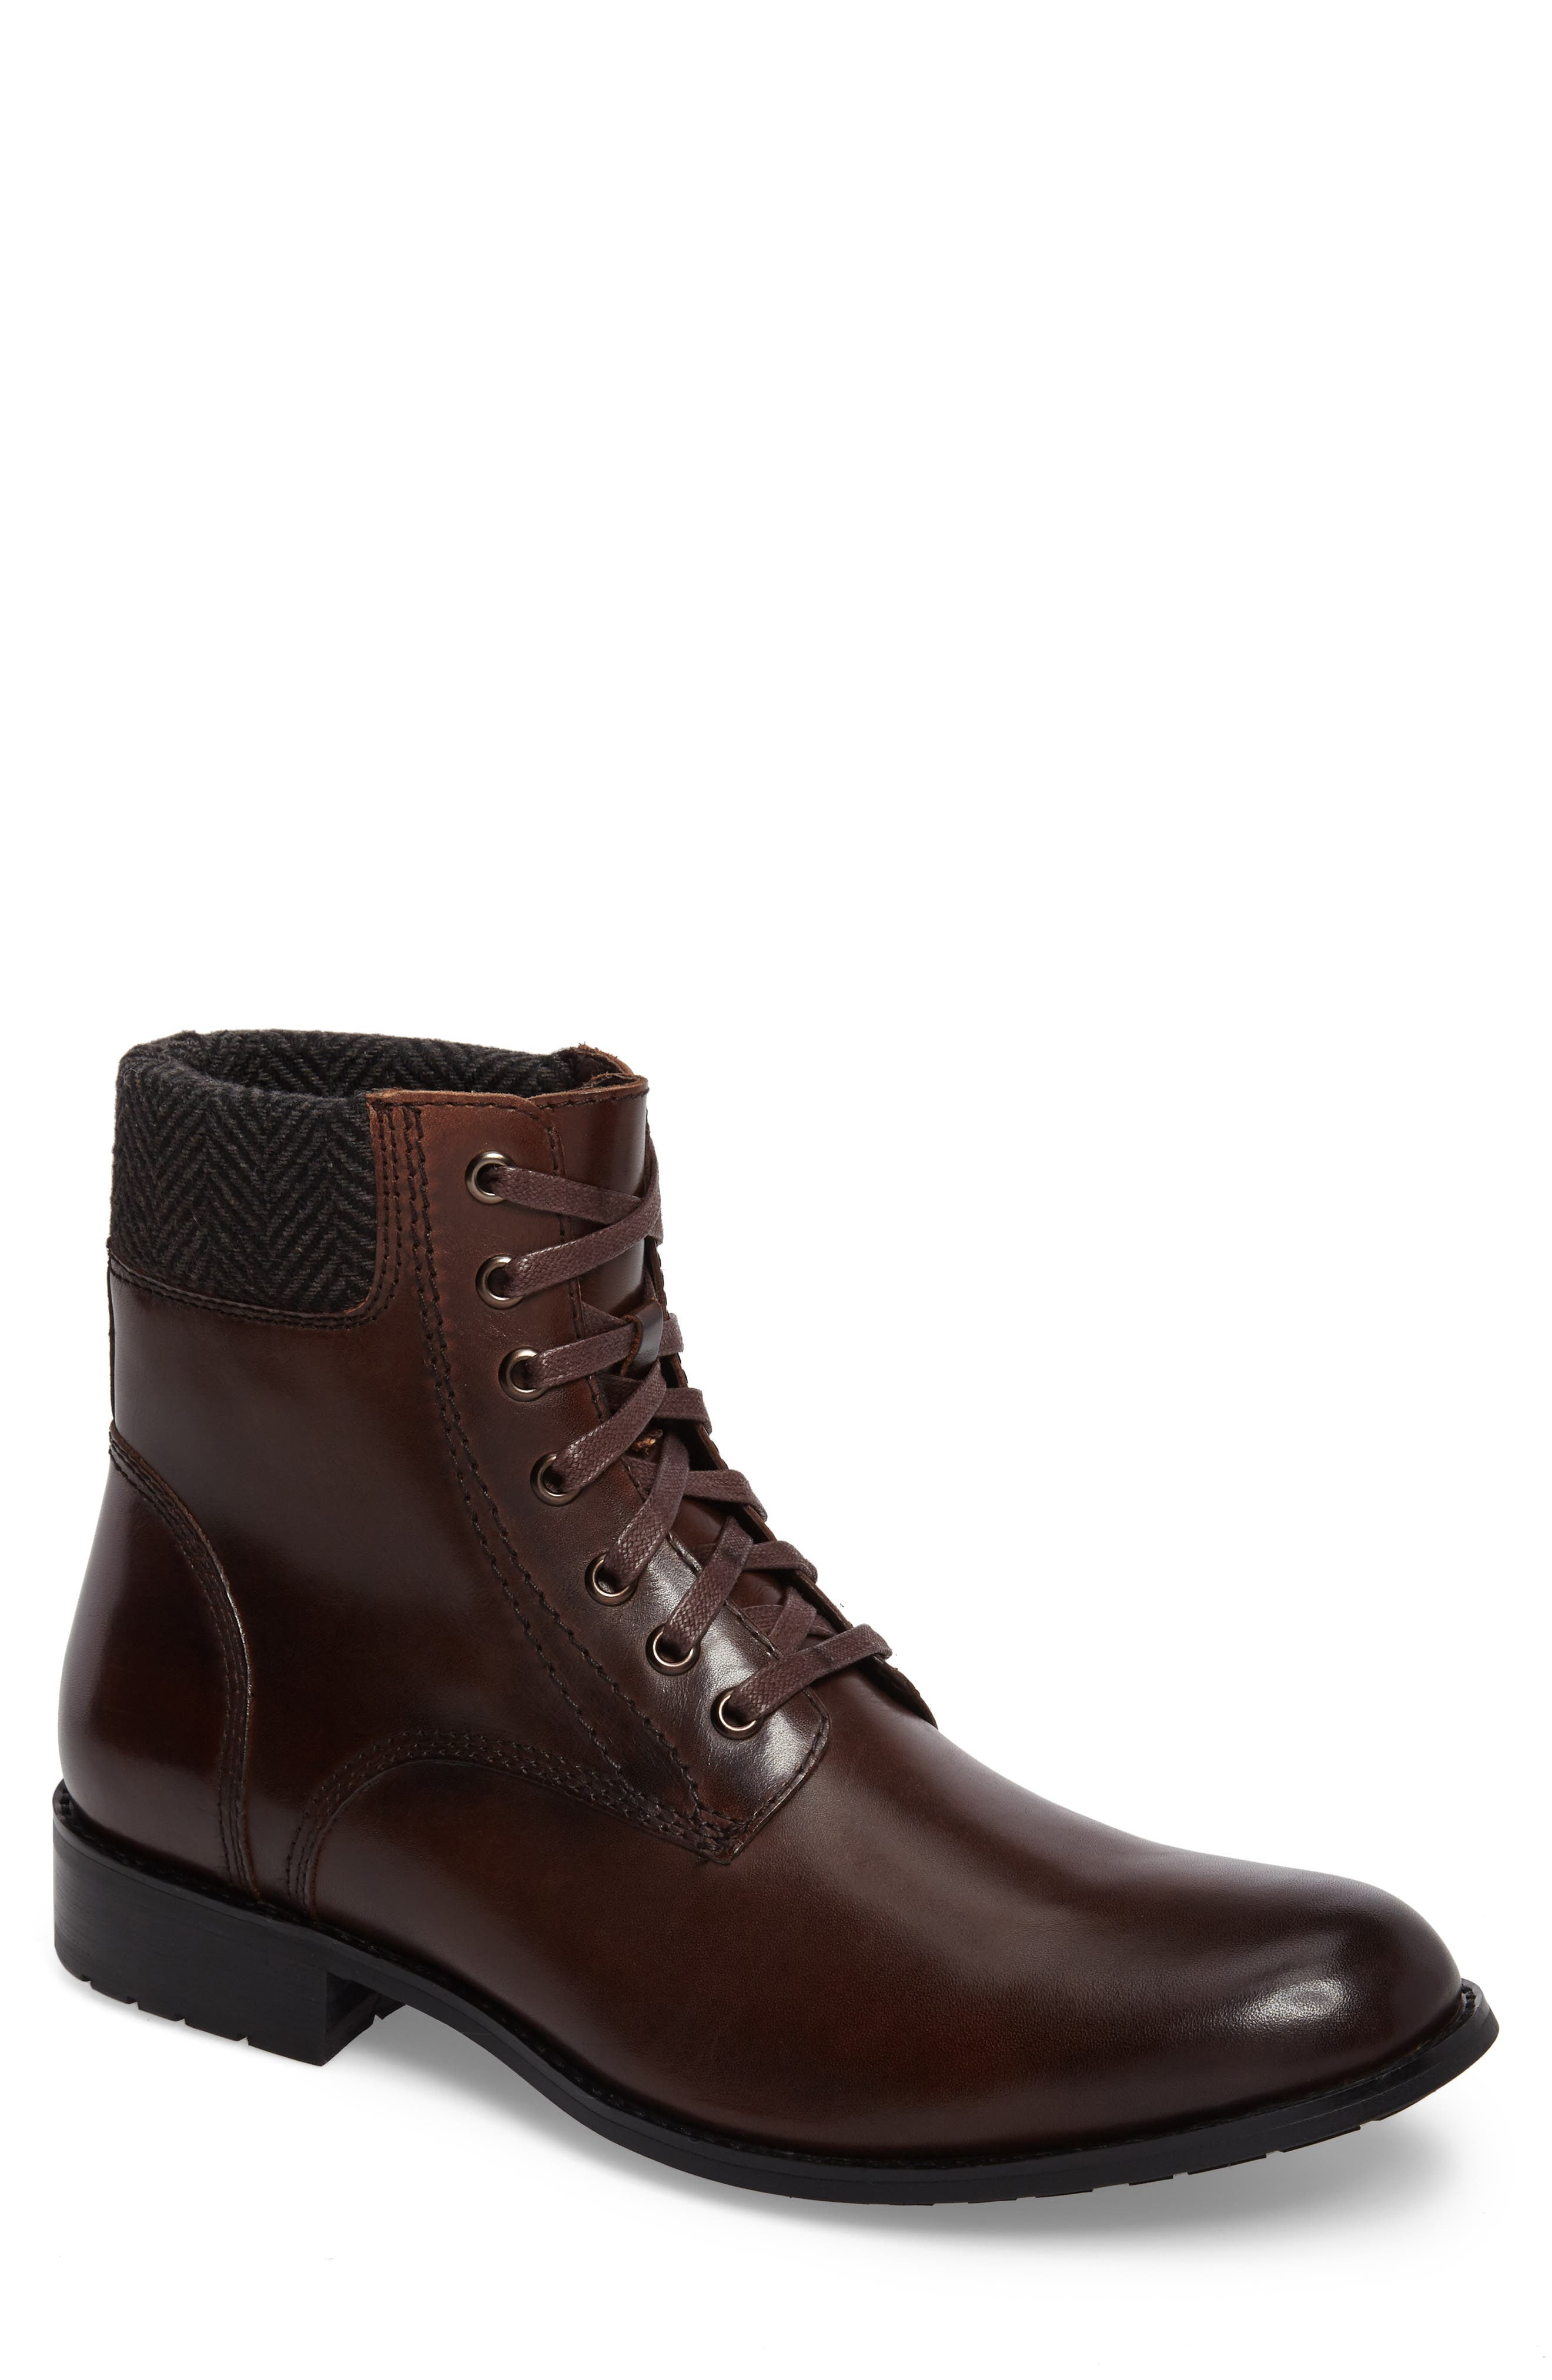 Saar Plain Toe Boot,                             Main thumbnail 1, color,                             Brown Leather